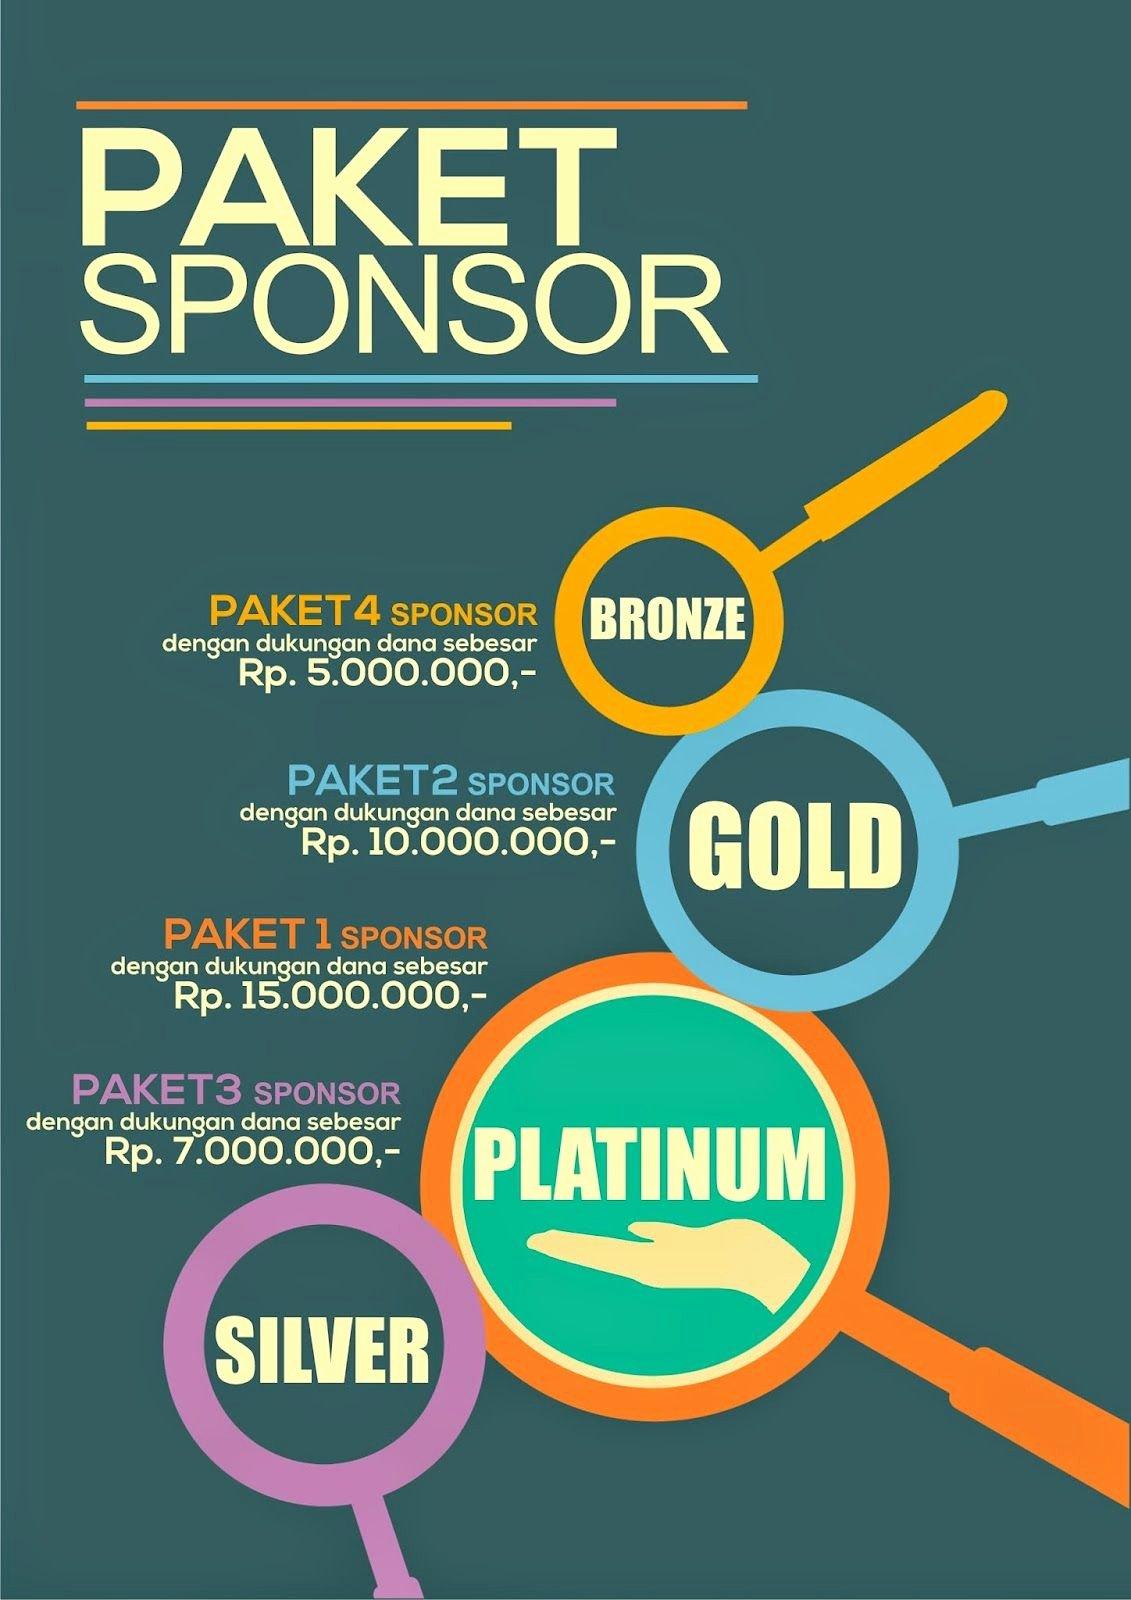 Event Sponsorship Proposal Example Elegant Sponsorship Proposal Design Google Search